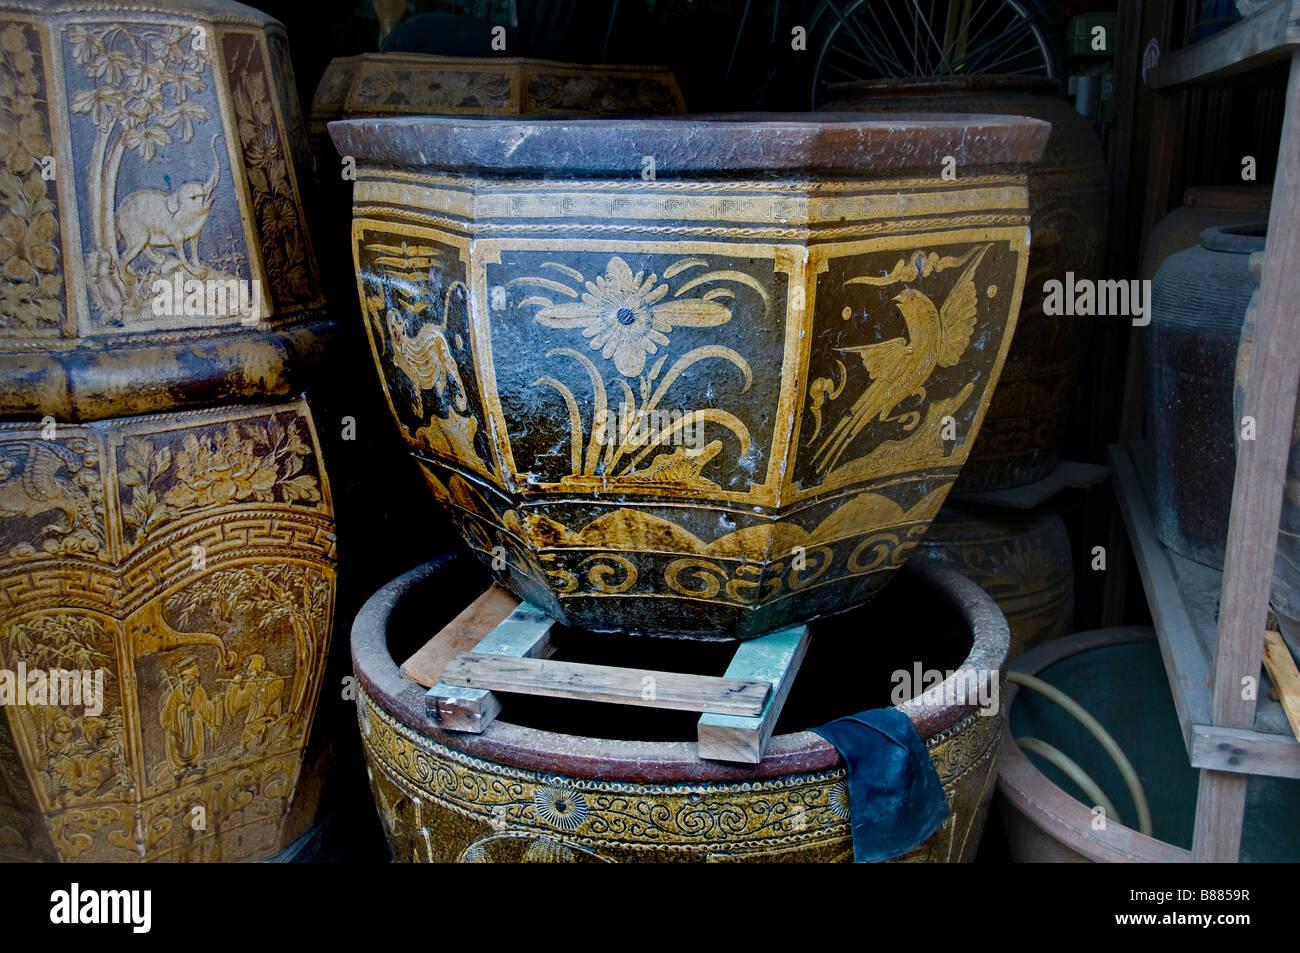 Malacca MalaysiaChinatown China Chinese earthenware crockery pottery antique shop - Stock Image